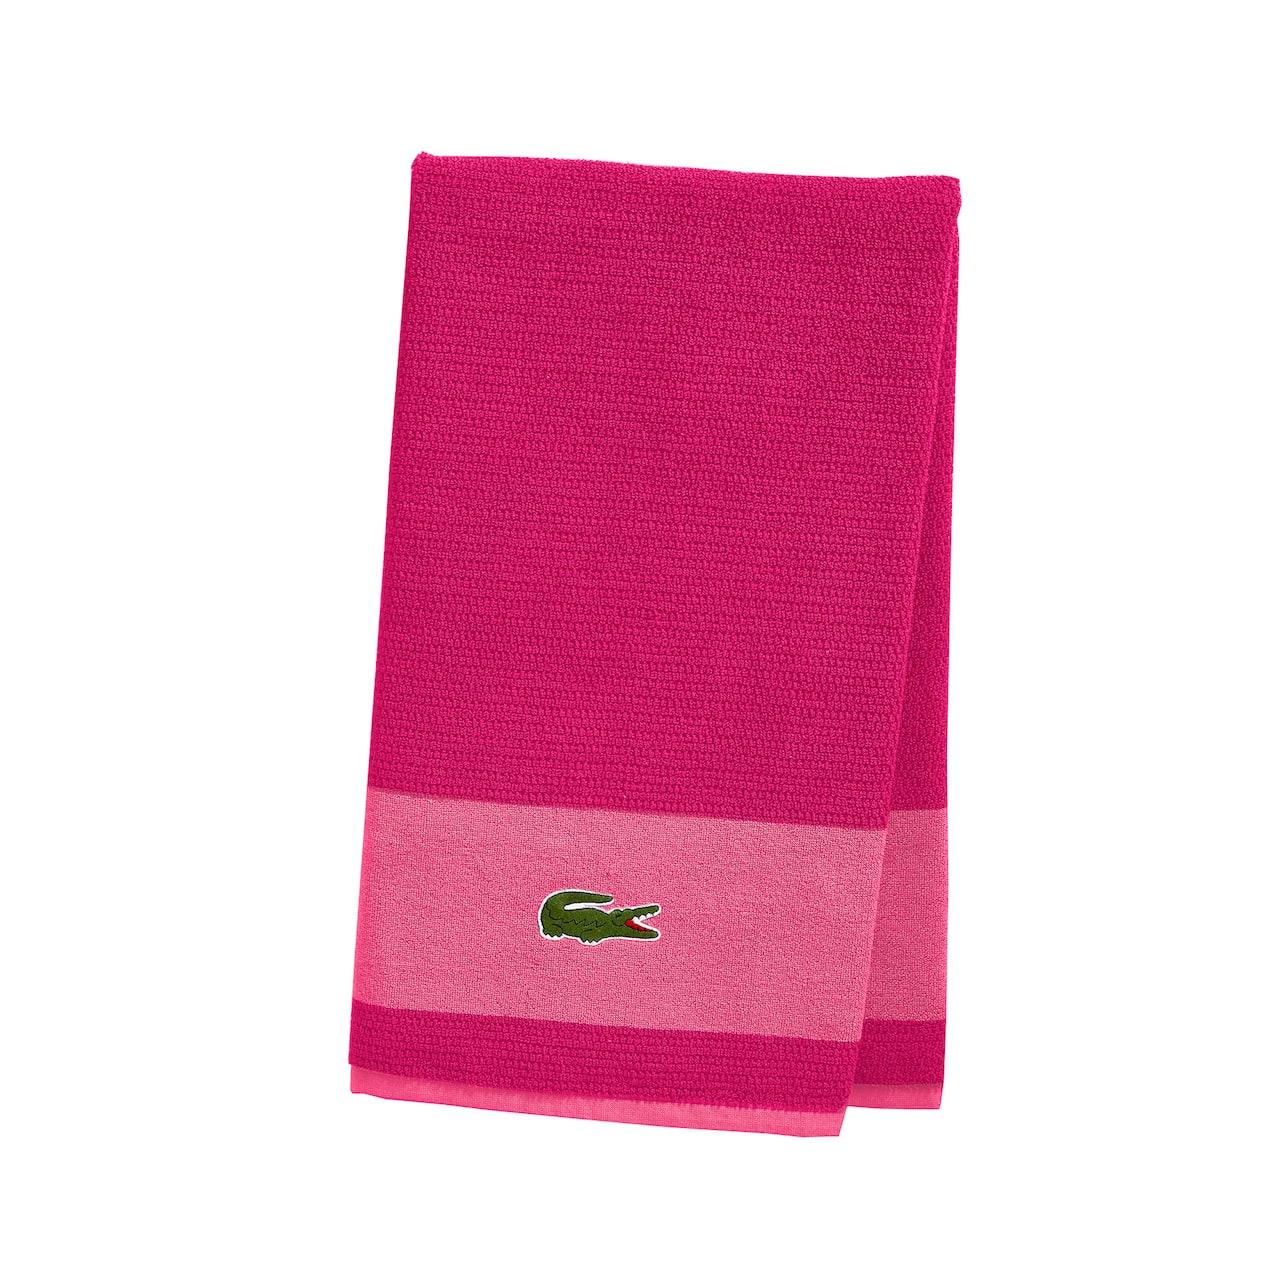 Match Towel